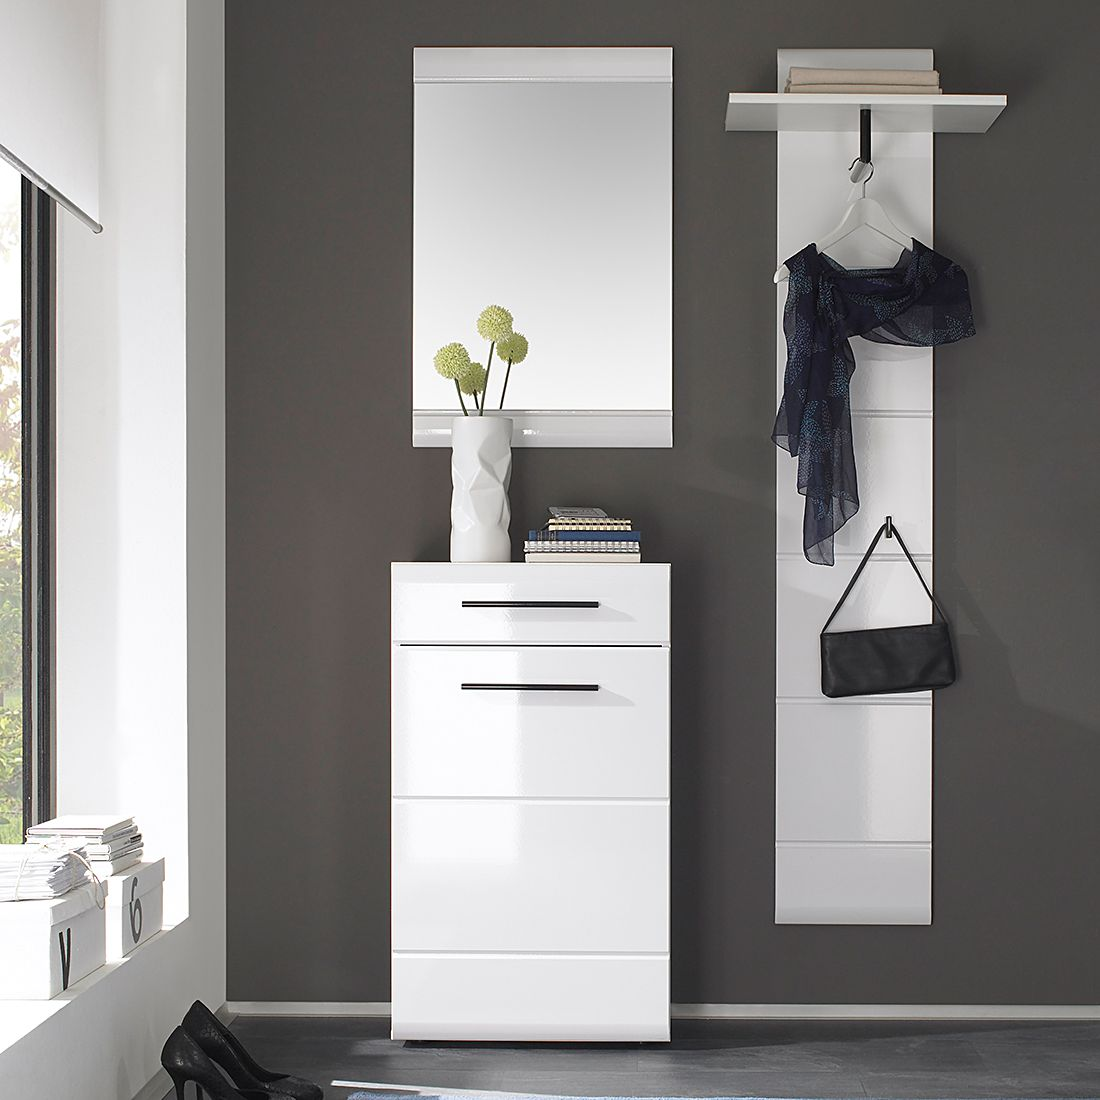 3 teilig garderobenset looma i in wei garderobe set flur. Black Bedroom Furniture Sets. Home Design Ideas